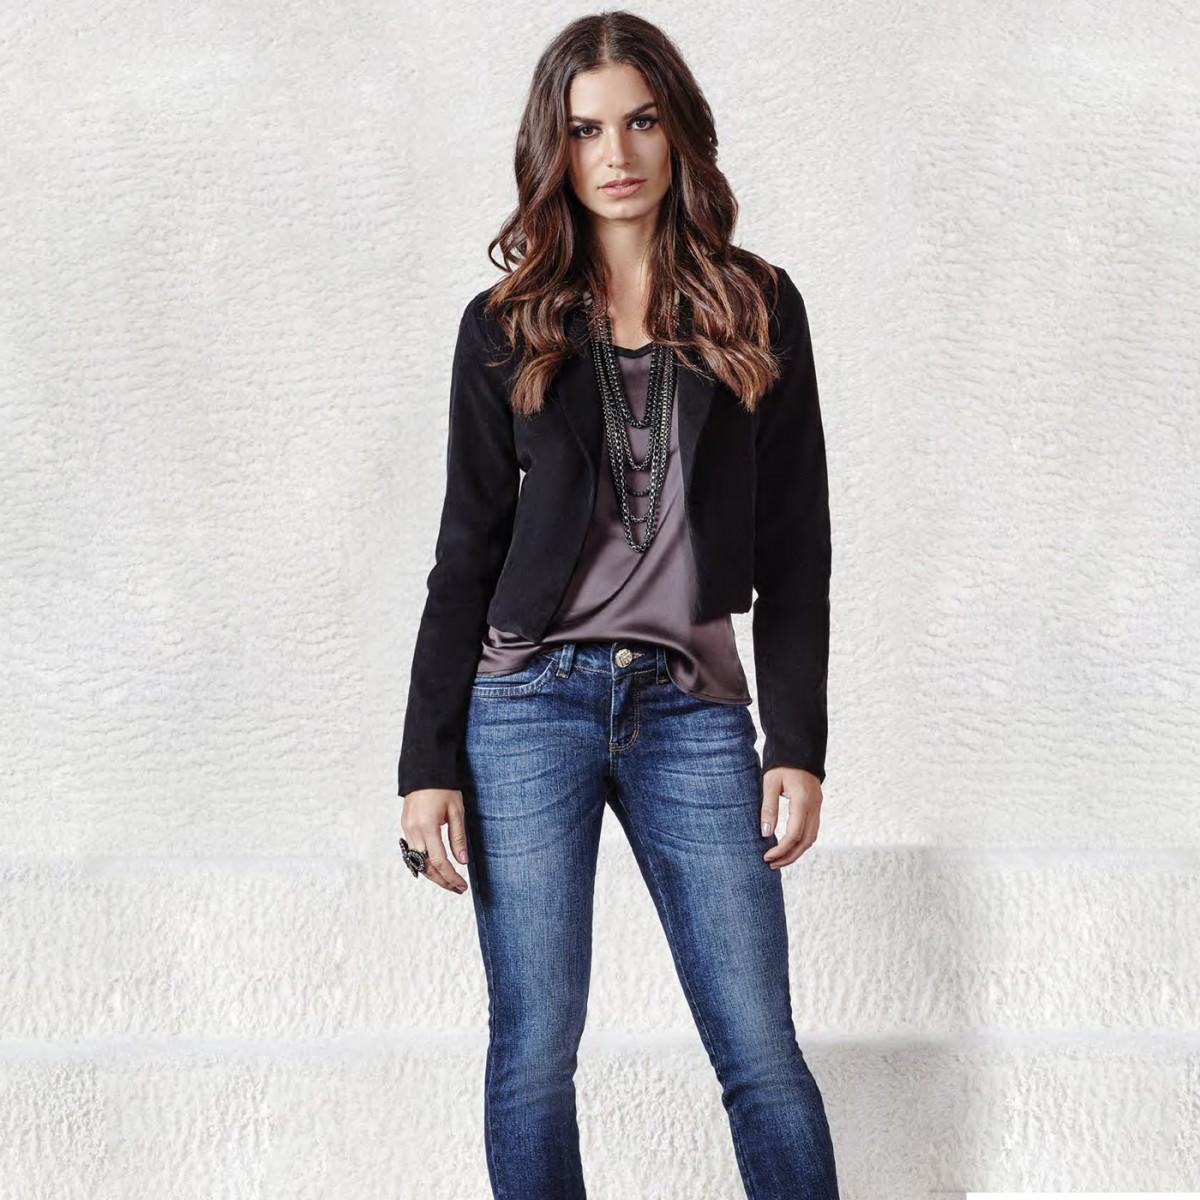 Bizz Store - Blazer Feminino Osmoze Veludo Preto Social Curto 9ff0706506